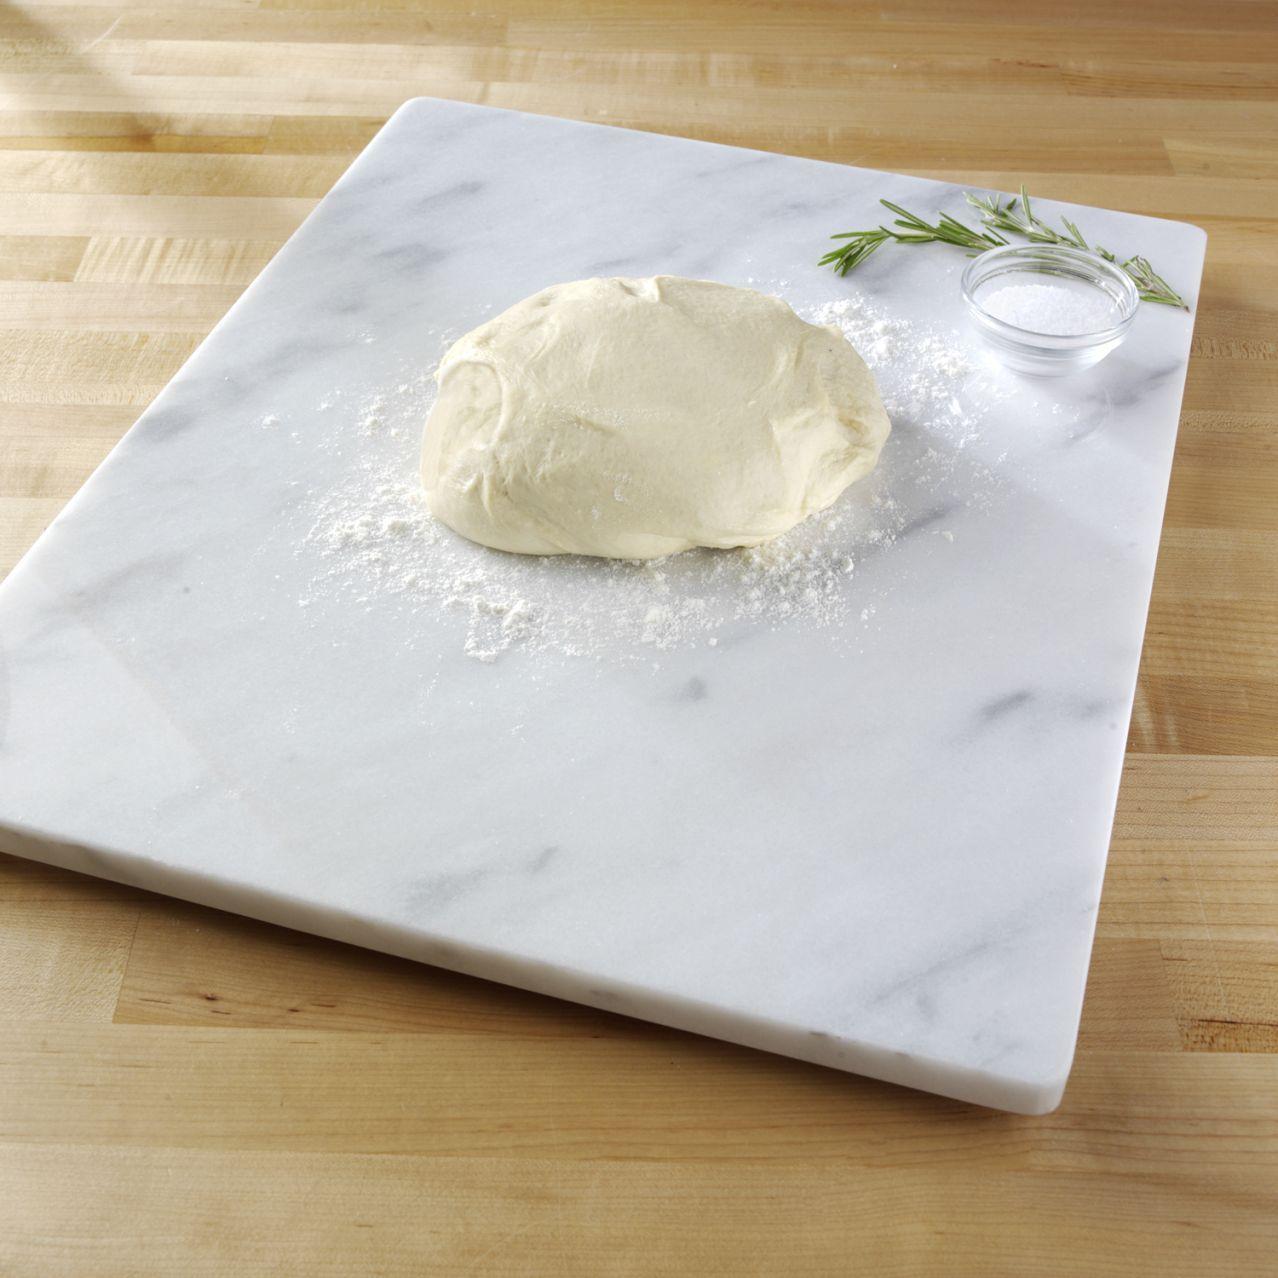 Sur La Table Marble Pastry Board 16 X 20 X 0 75 Sur La Table Marble Pastry Board Kitchen Marble Pastry Board